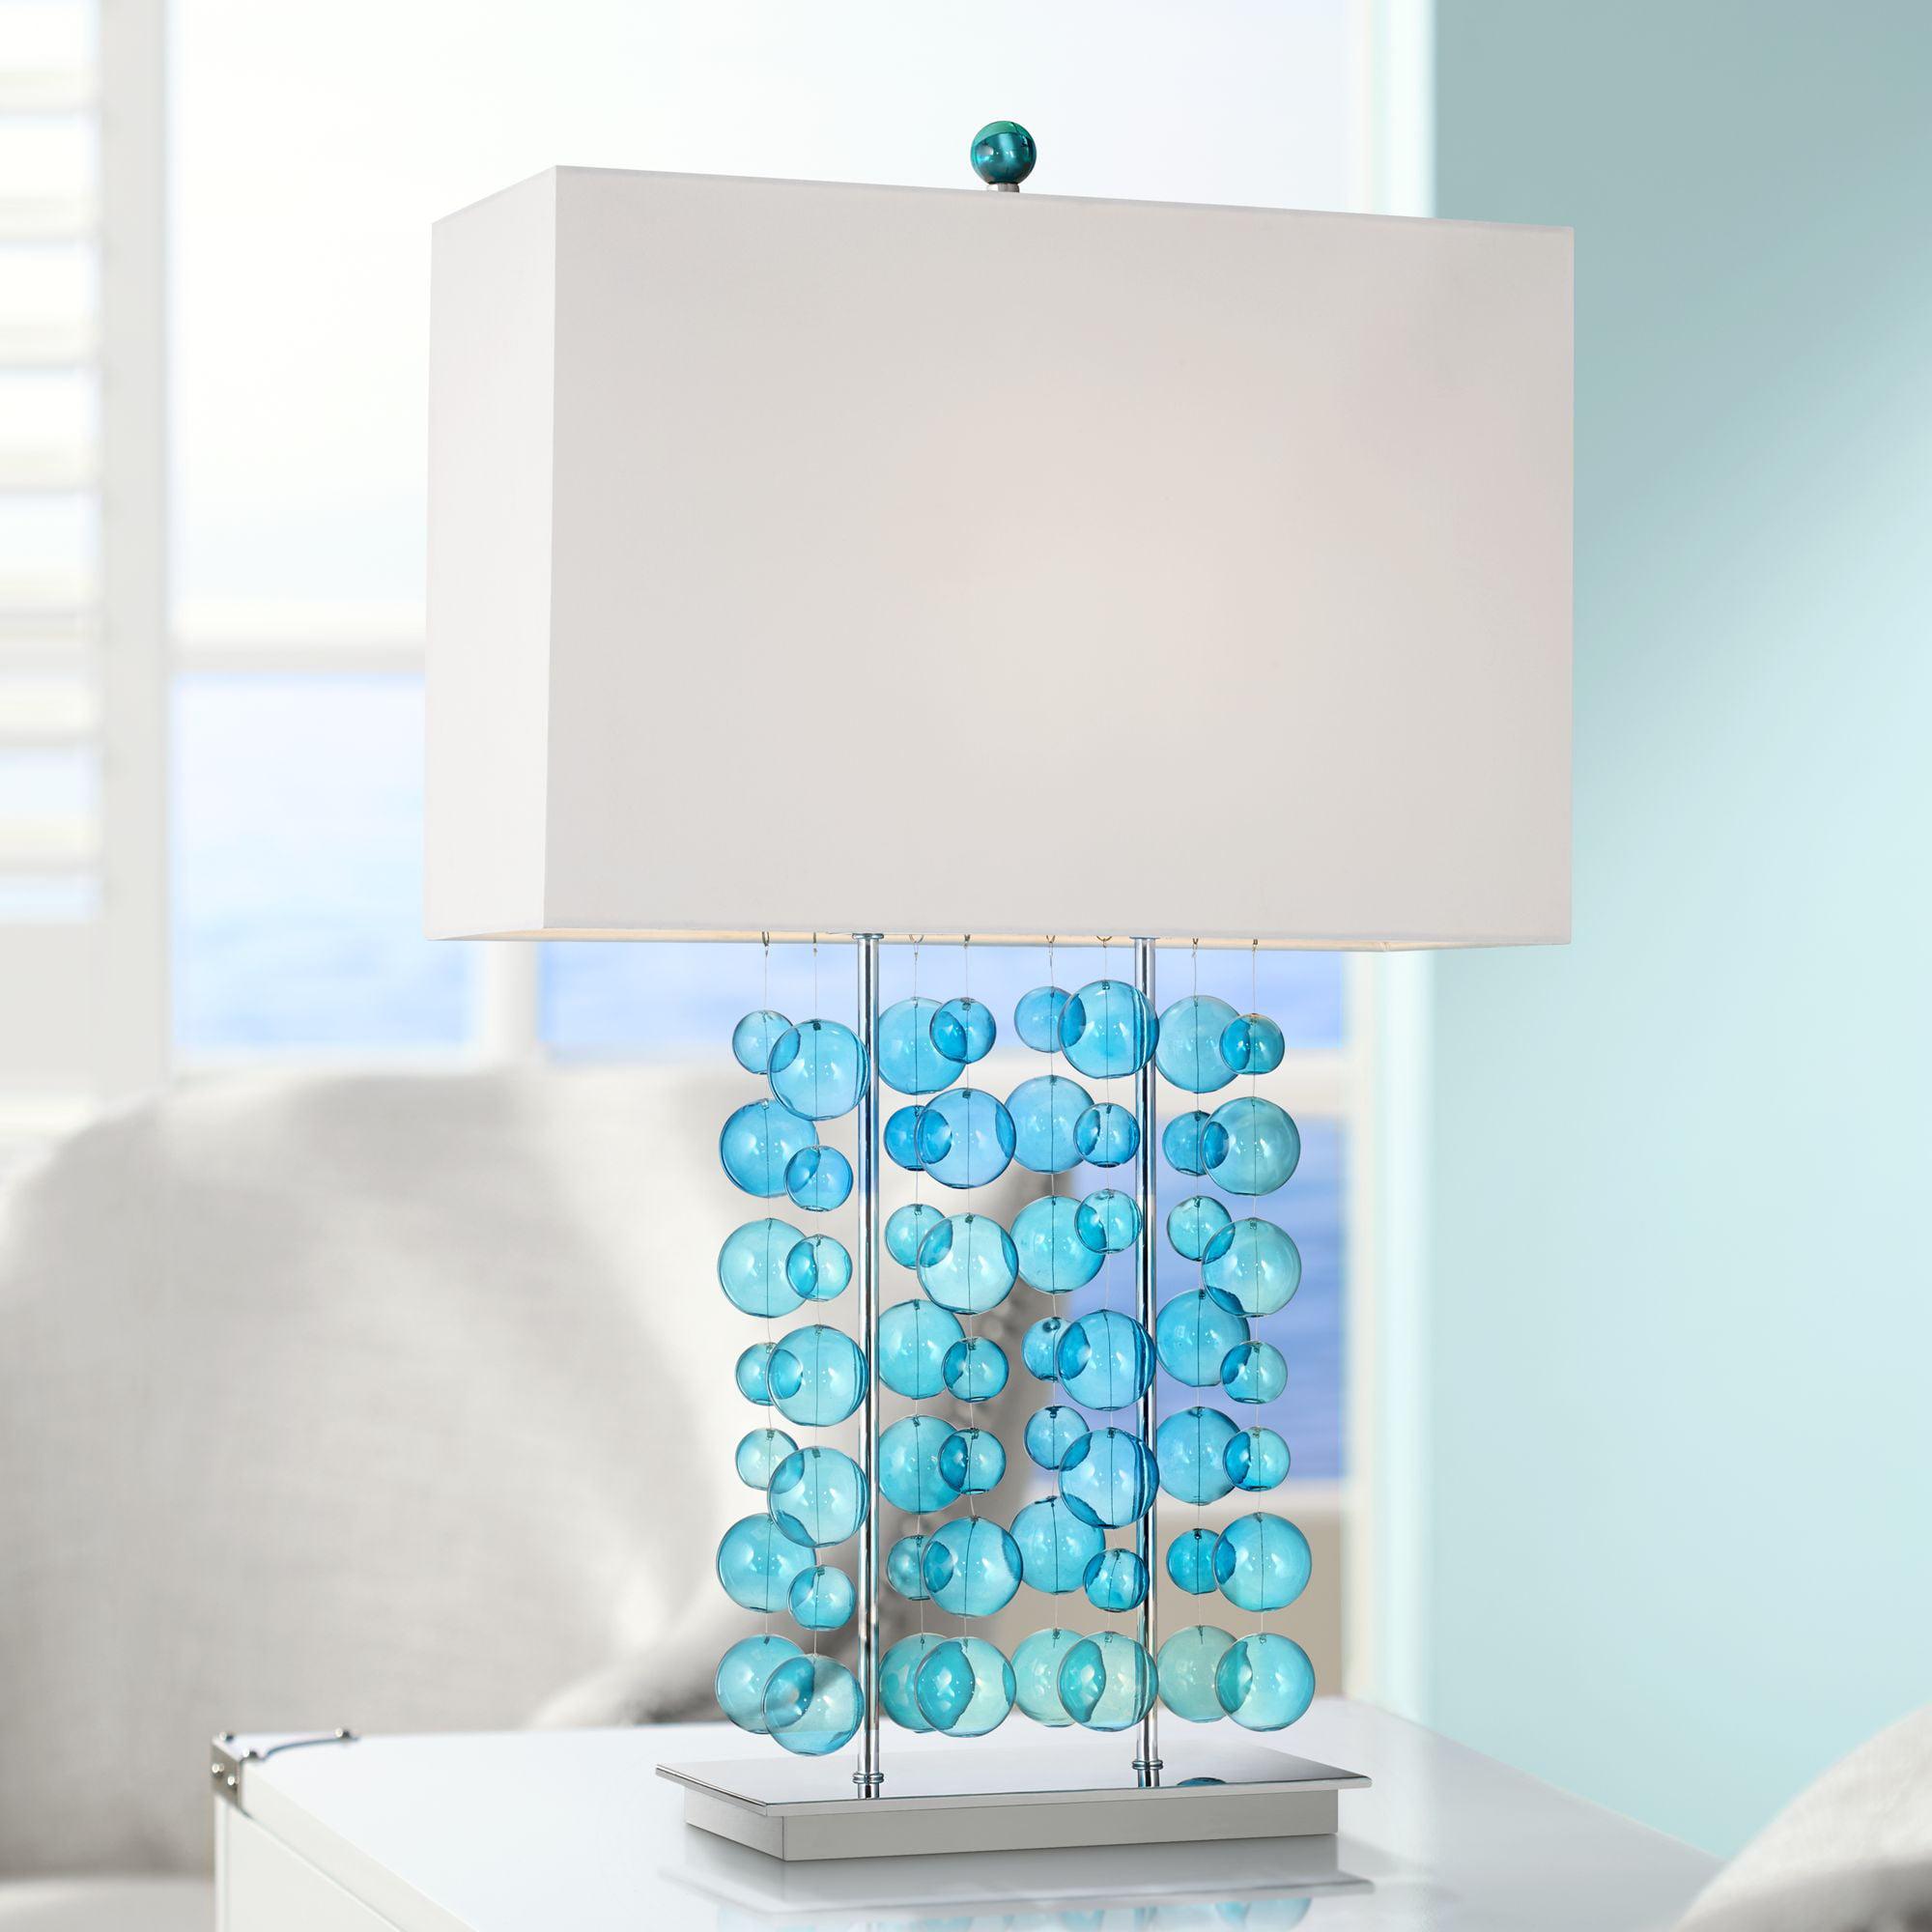 Possini Euro Design Modern Table Lamp Blue Bubble Cascade Glass Chrome Bright White Box Shade For Living Room Bedroom Family Walmart Com Walmart Com